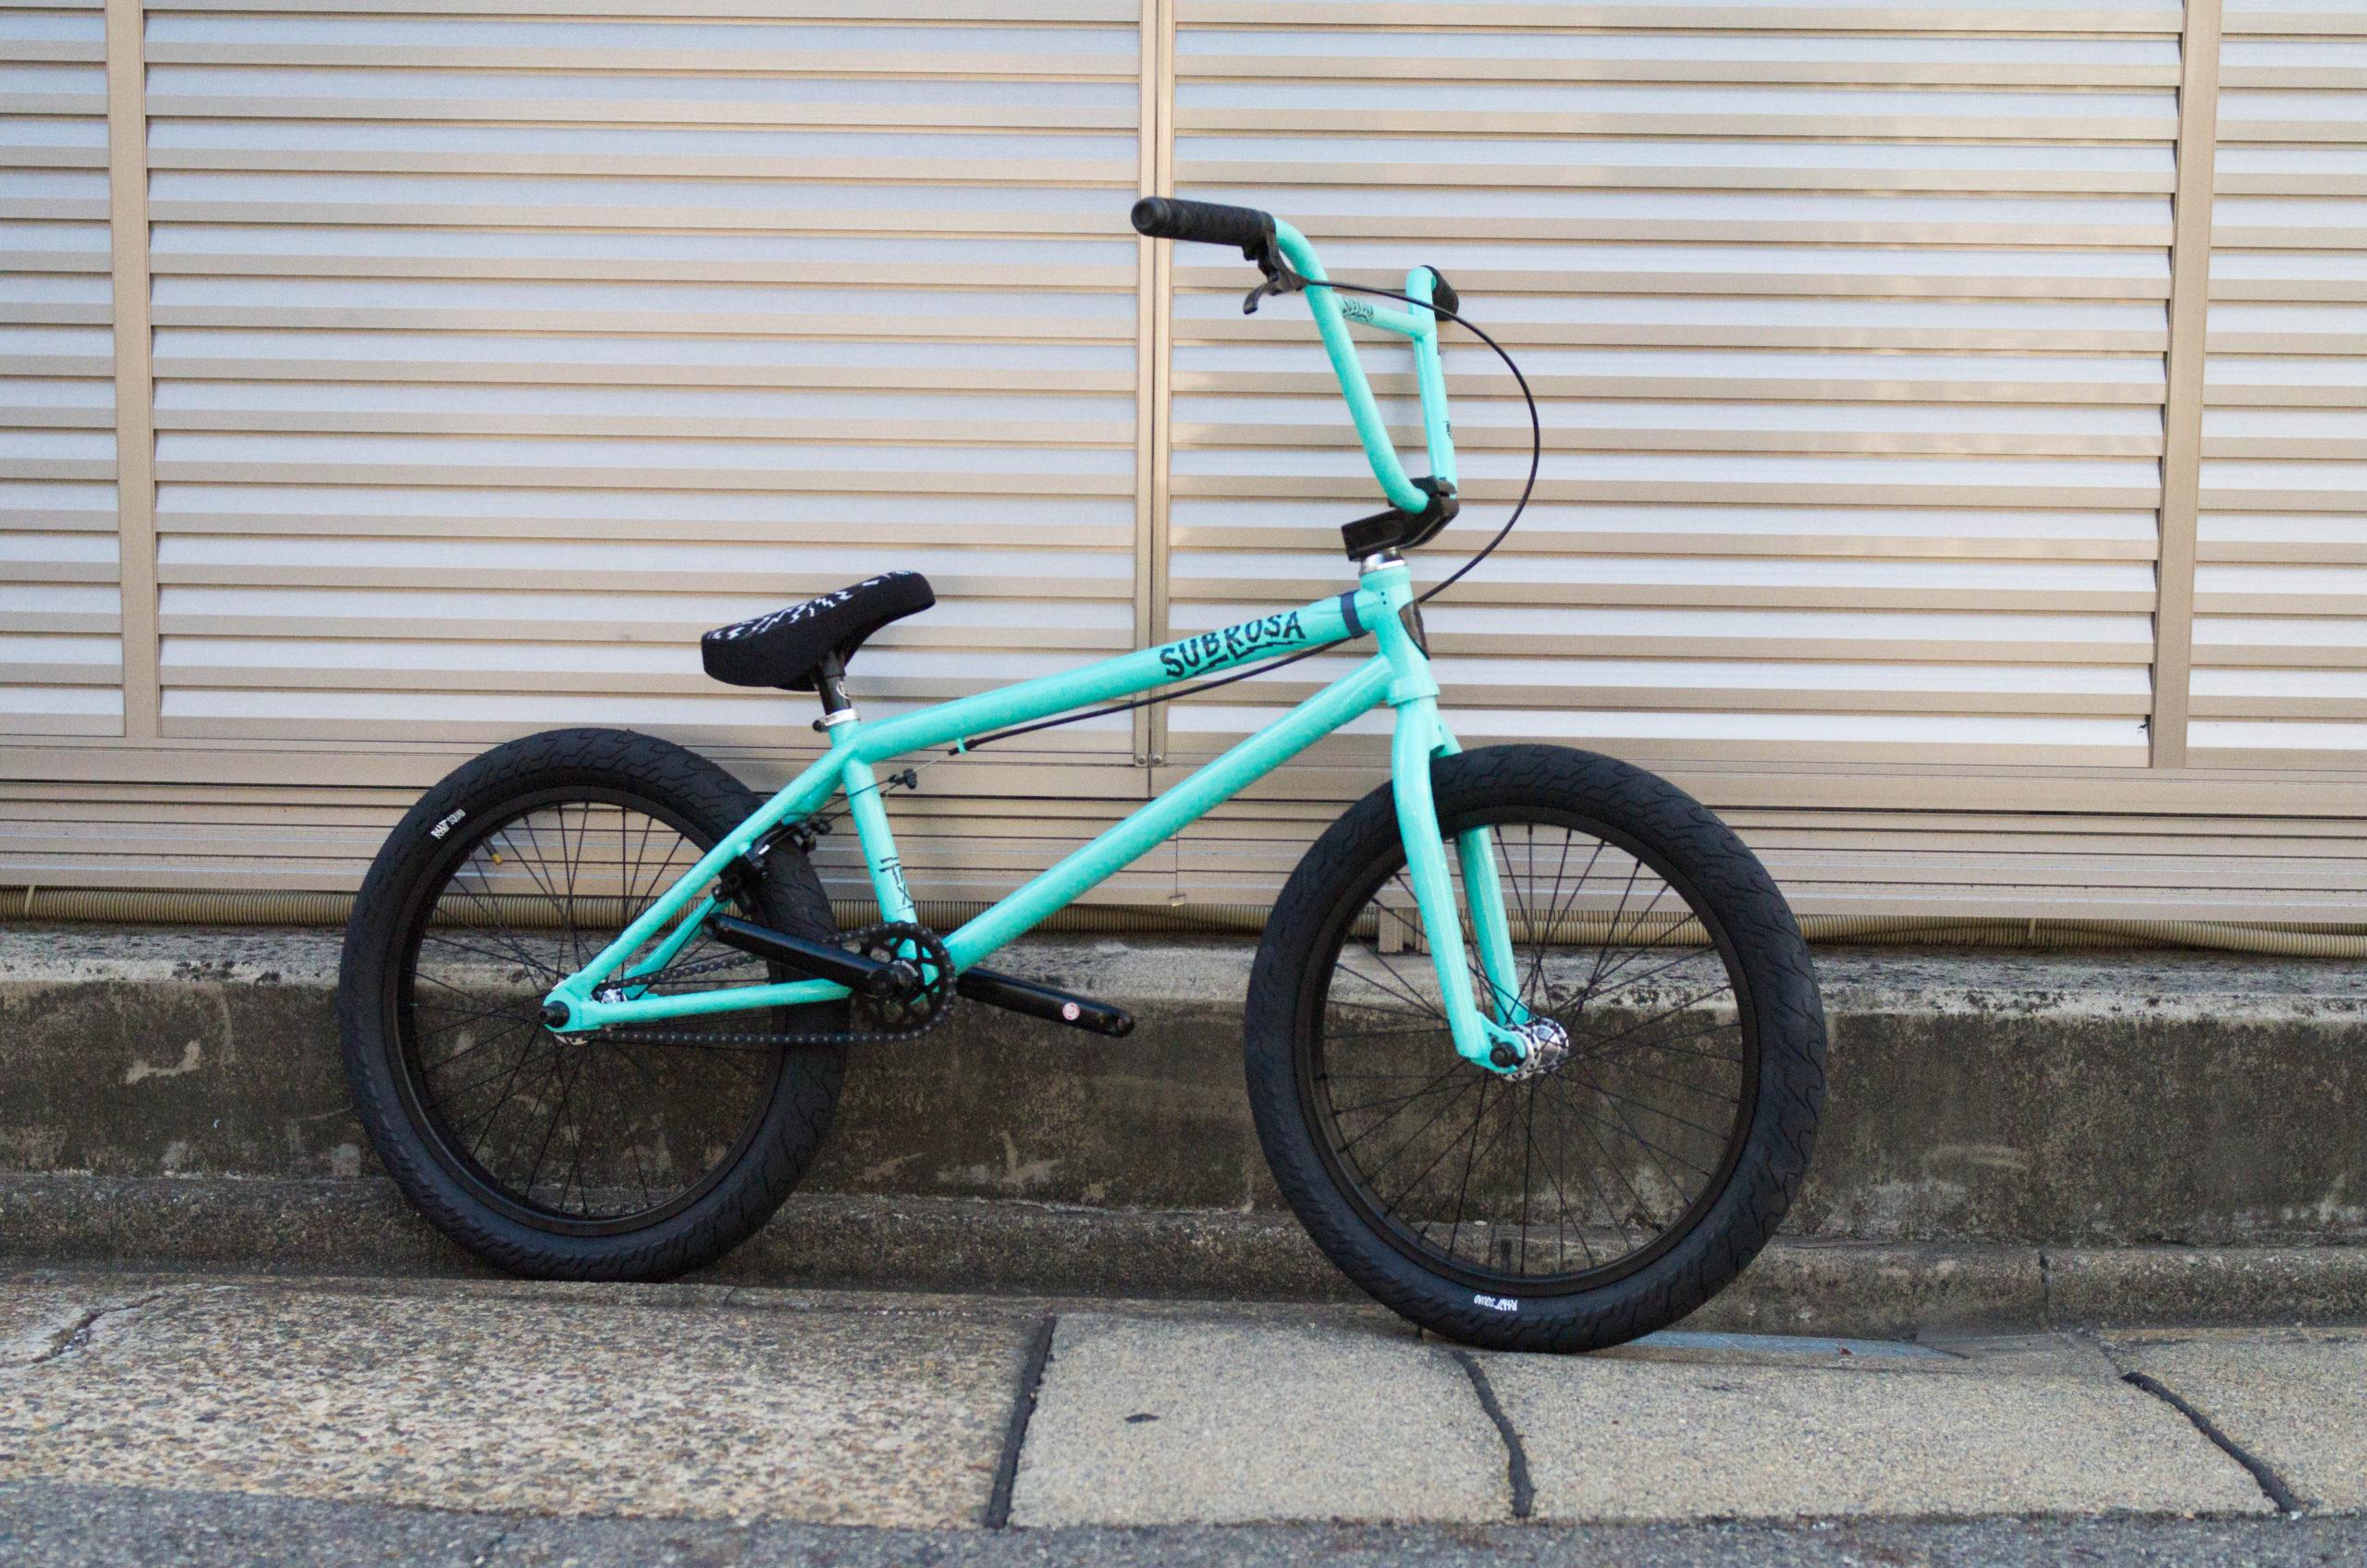 SUBROSA BMX 2018 Complete Bike Tiro XL入荷!